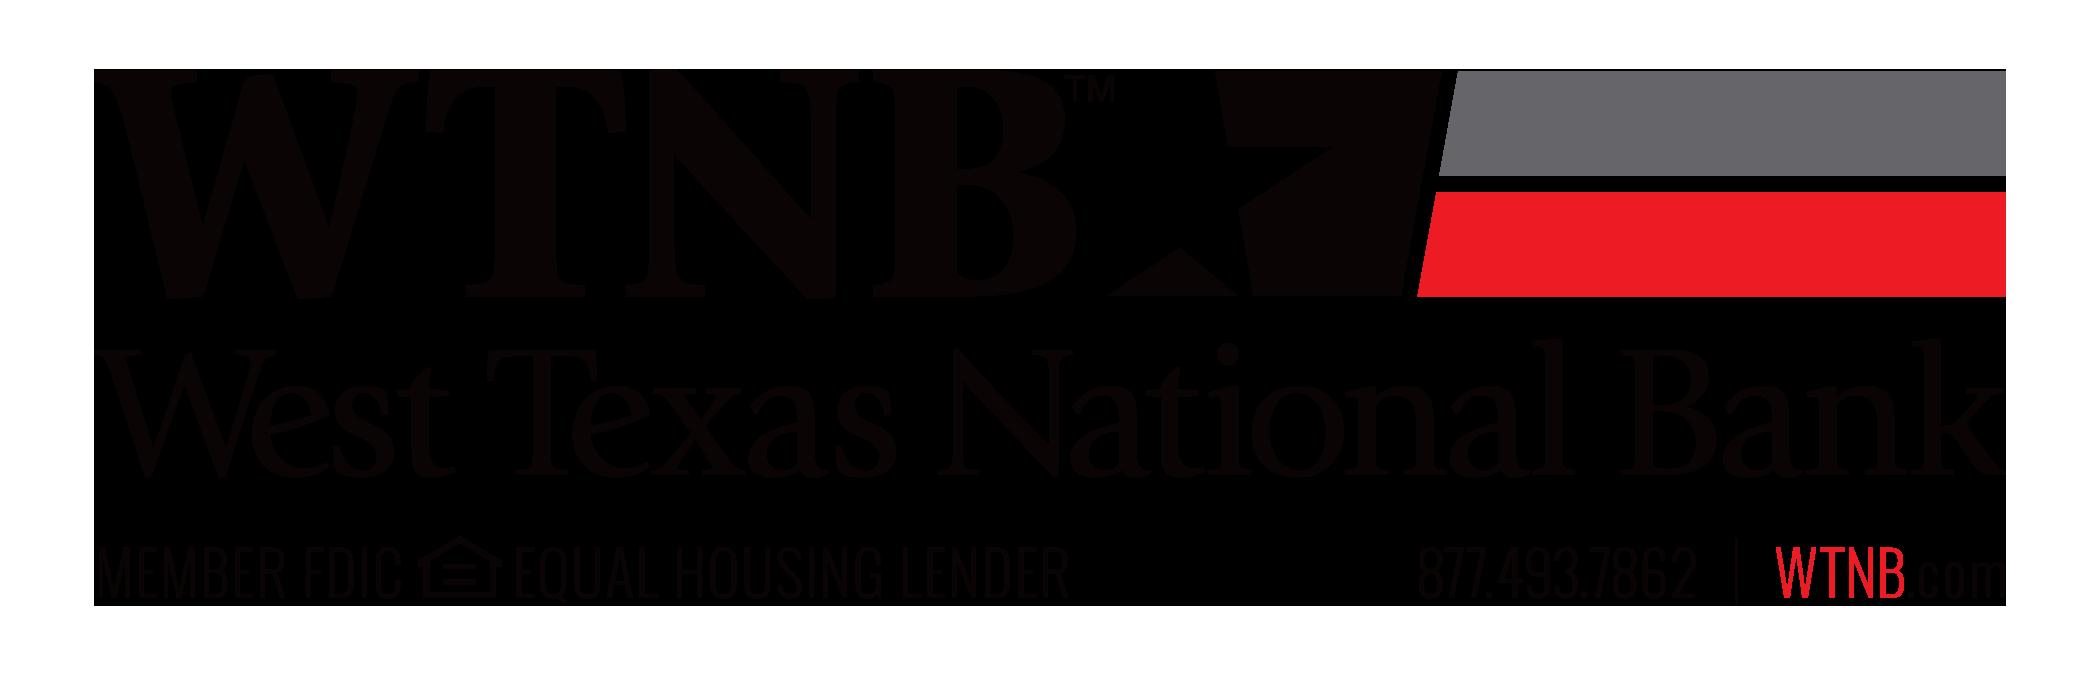 West Texas National Bank logo